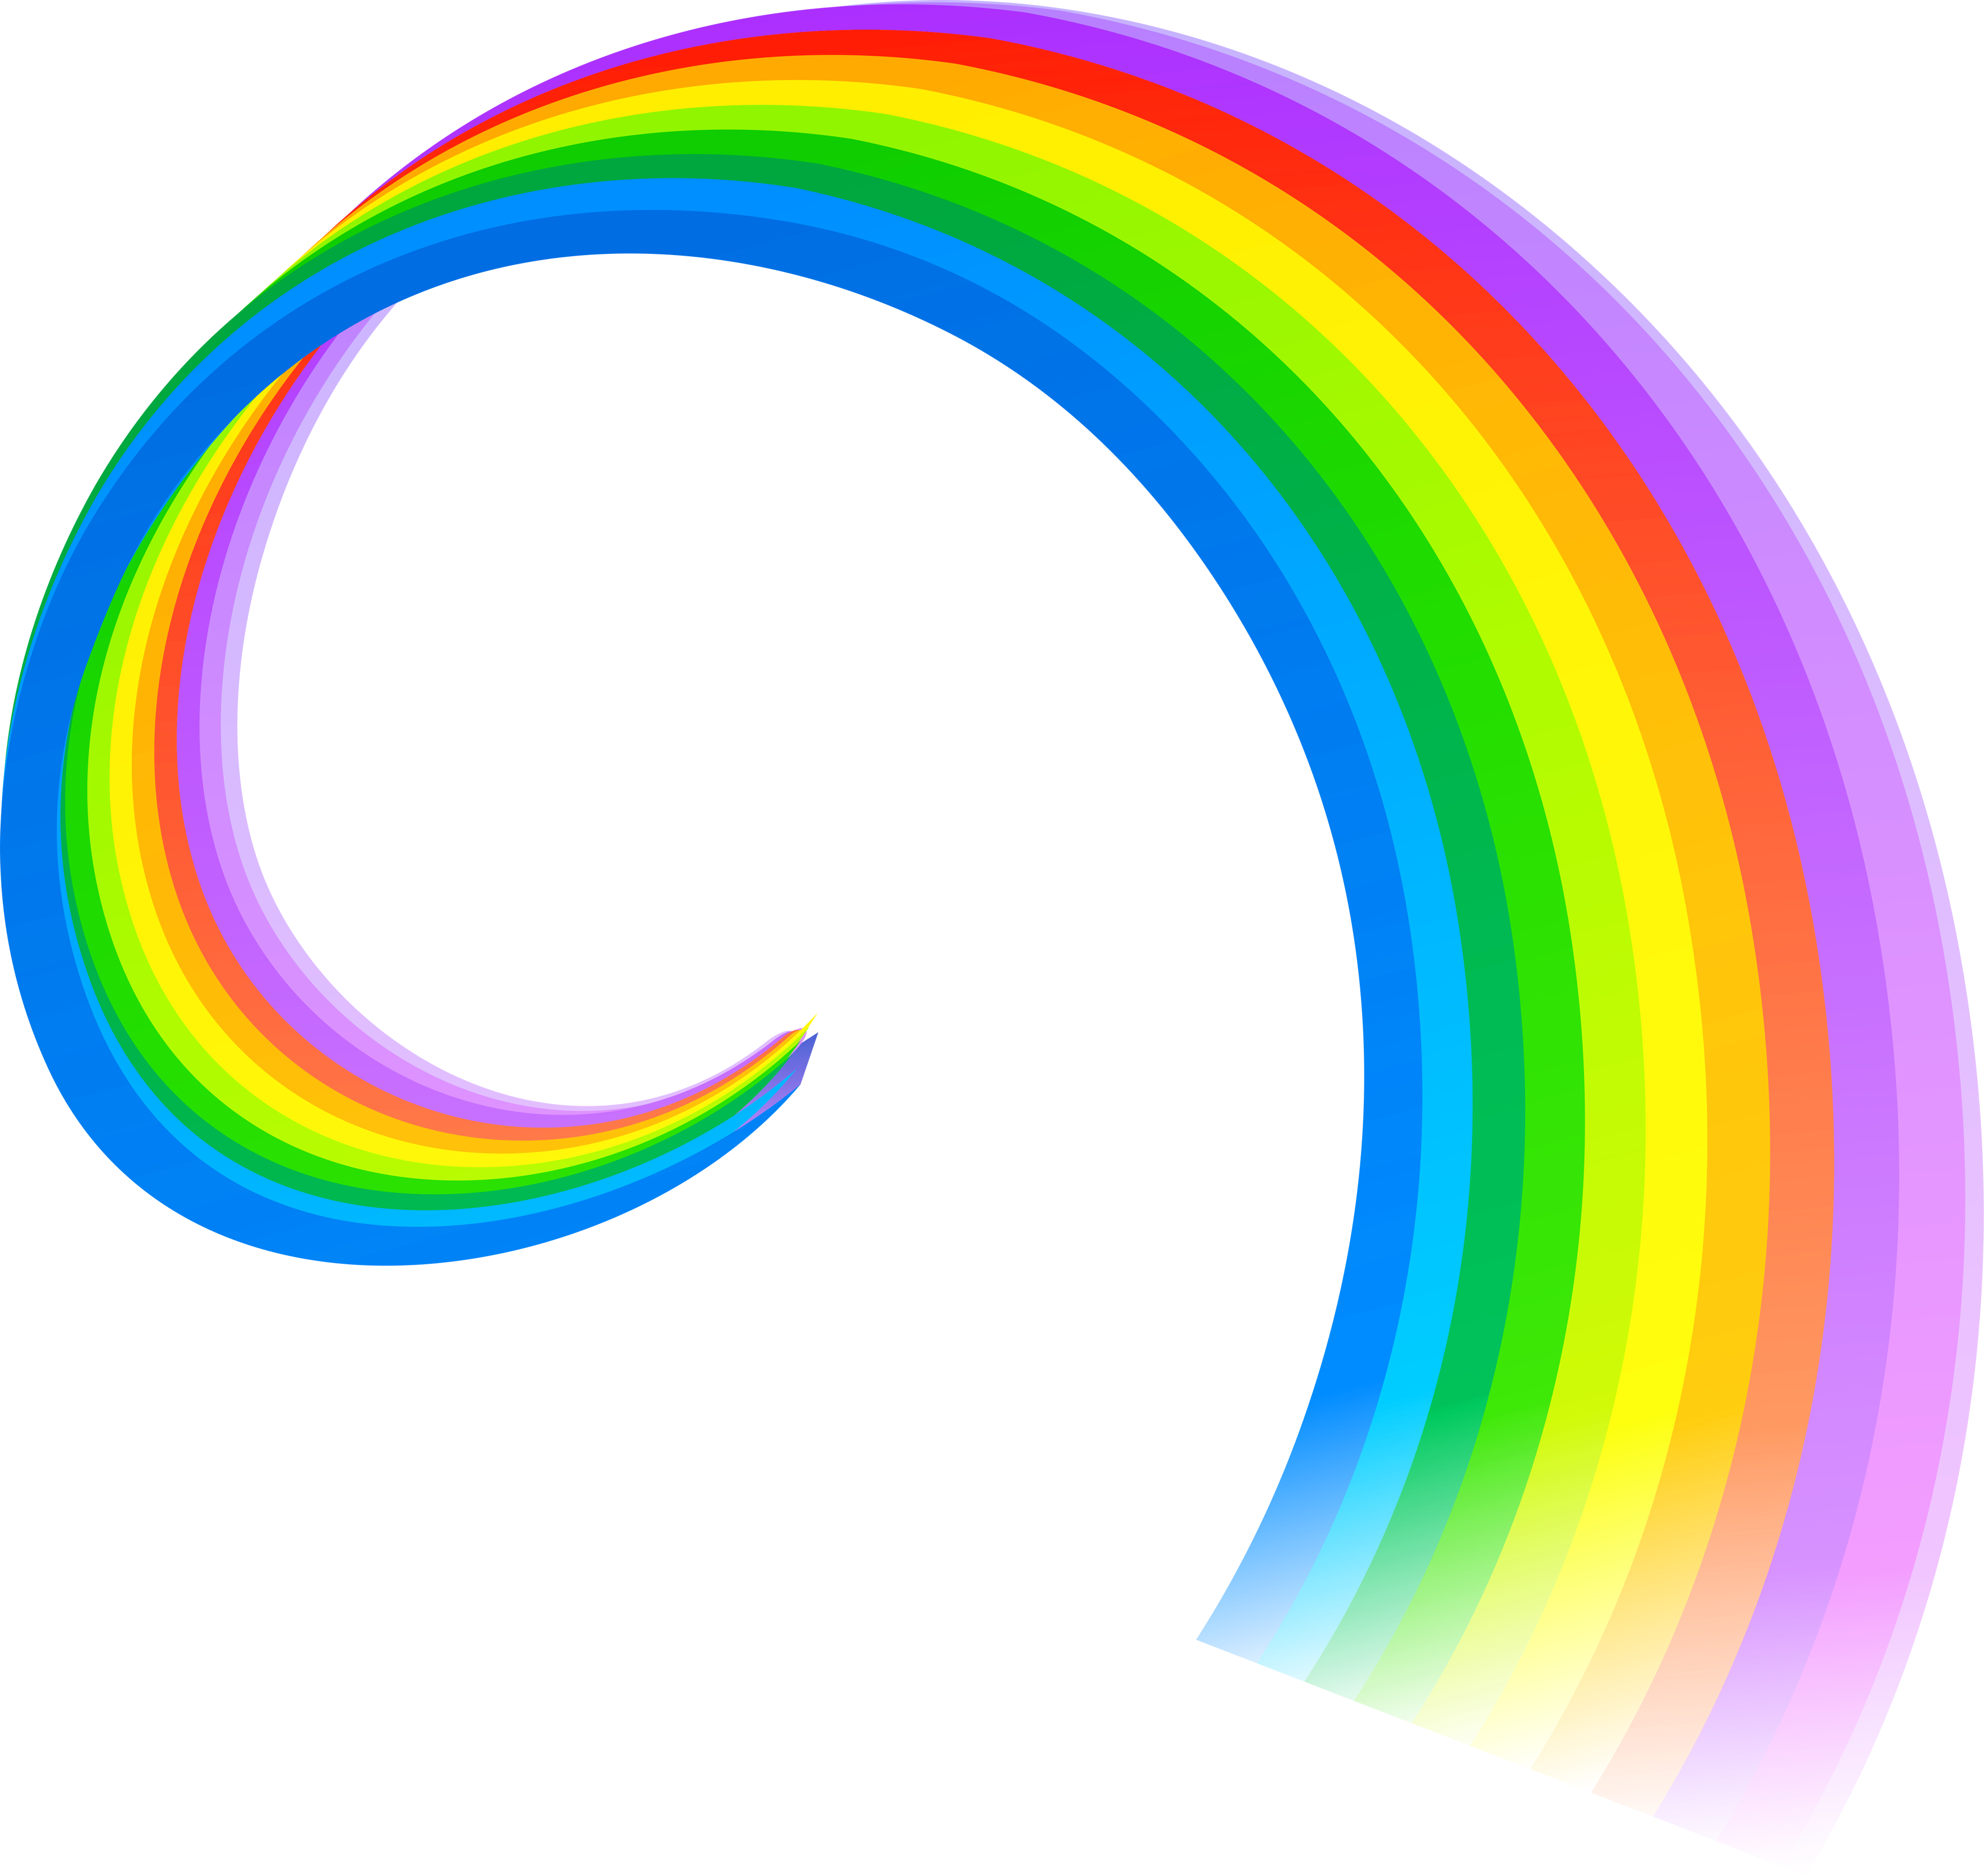 Rainbow PNG image - Rainbow HD PNG